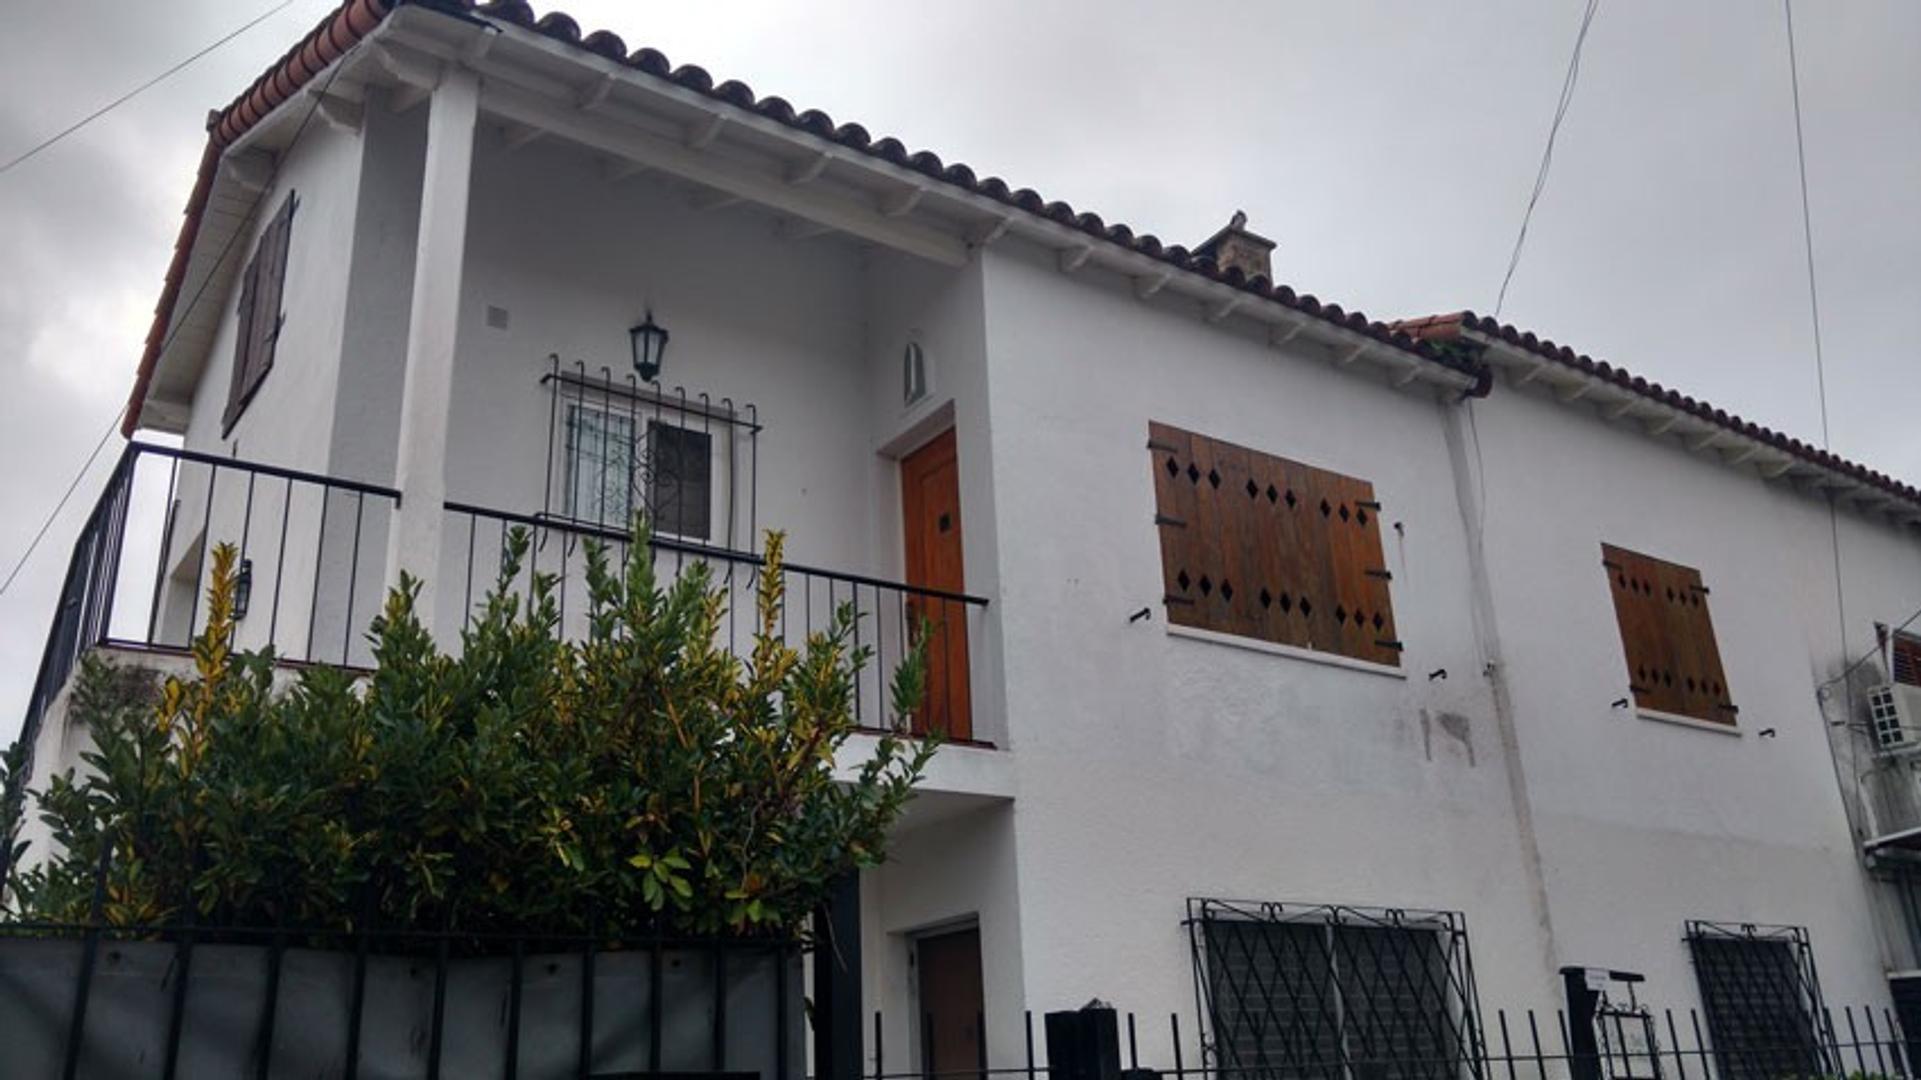 Circ. 1ª Secc. 4ª. Barrio 200 viviendas - Depto. + Casa. U$S 165.000.- Apto Crédito.